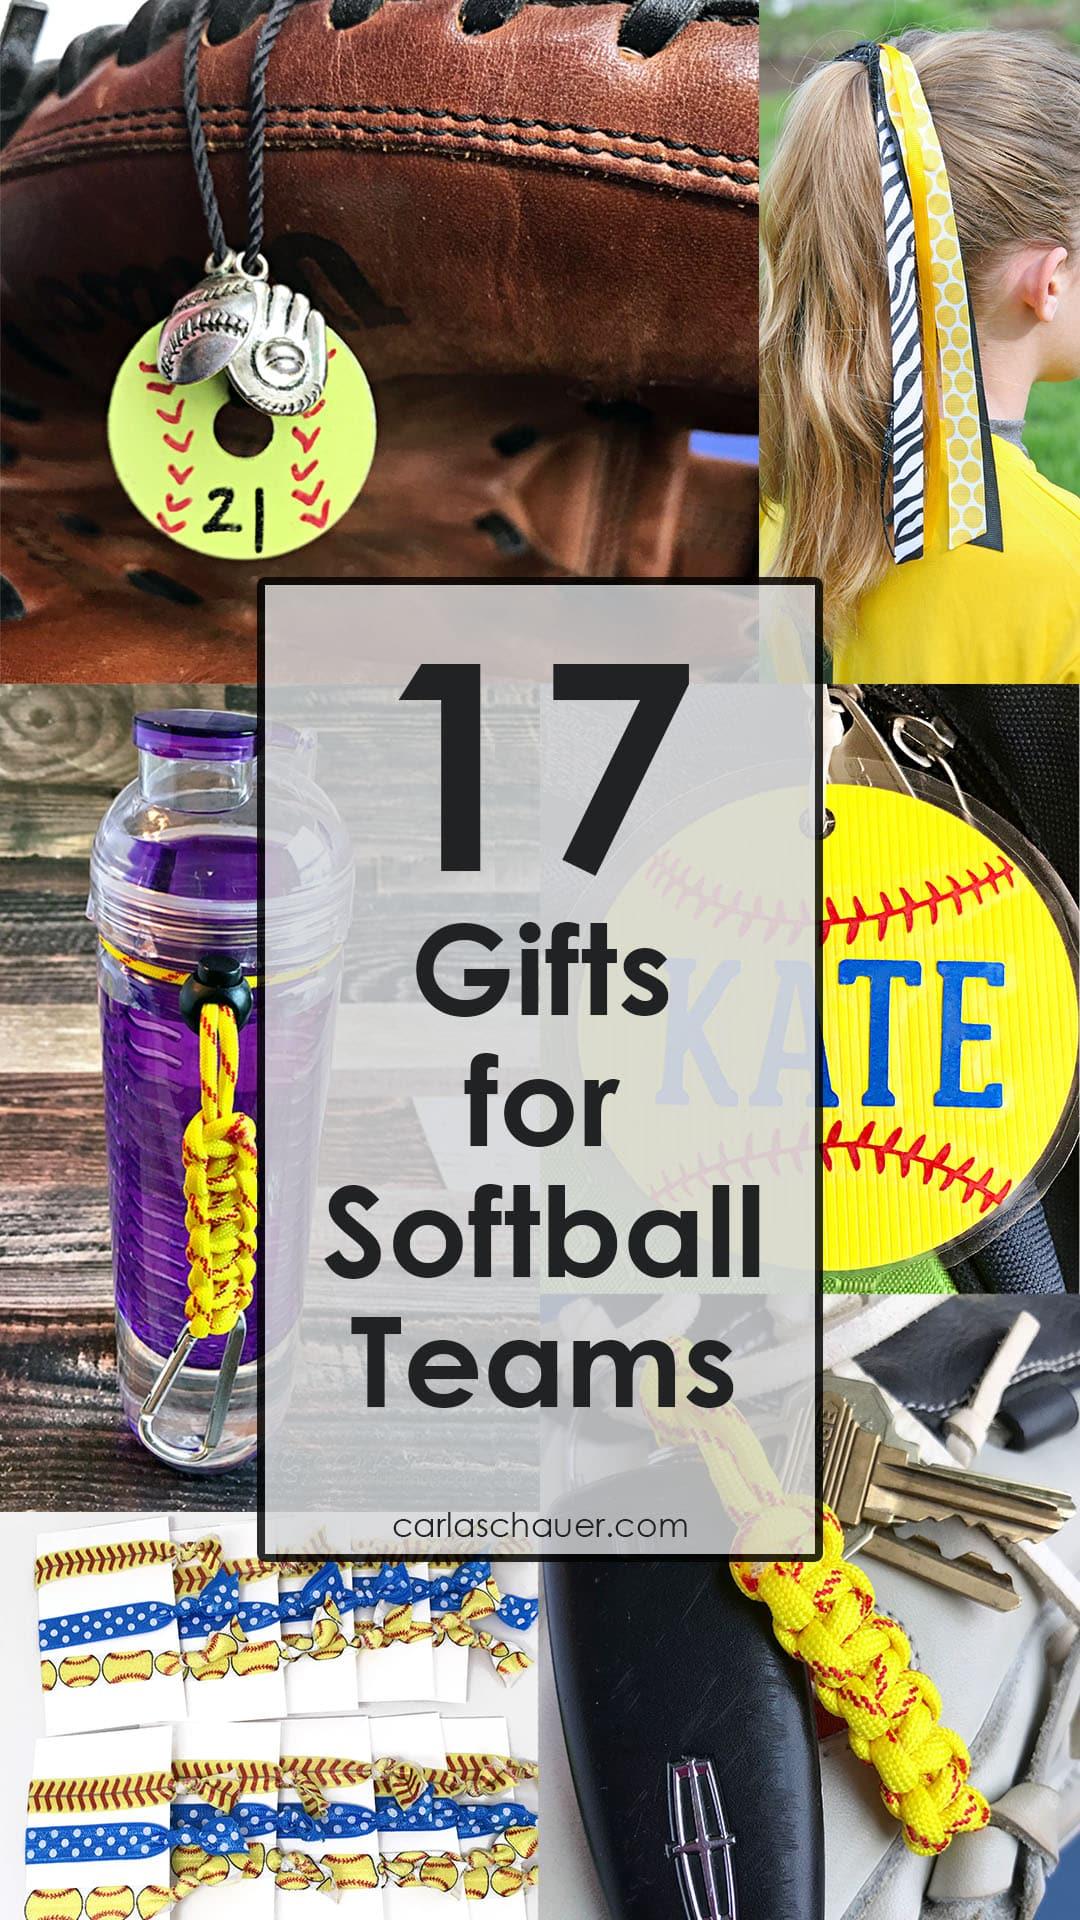 A variety of softball team gift ideas.